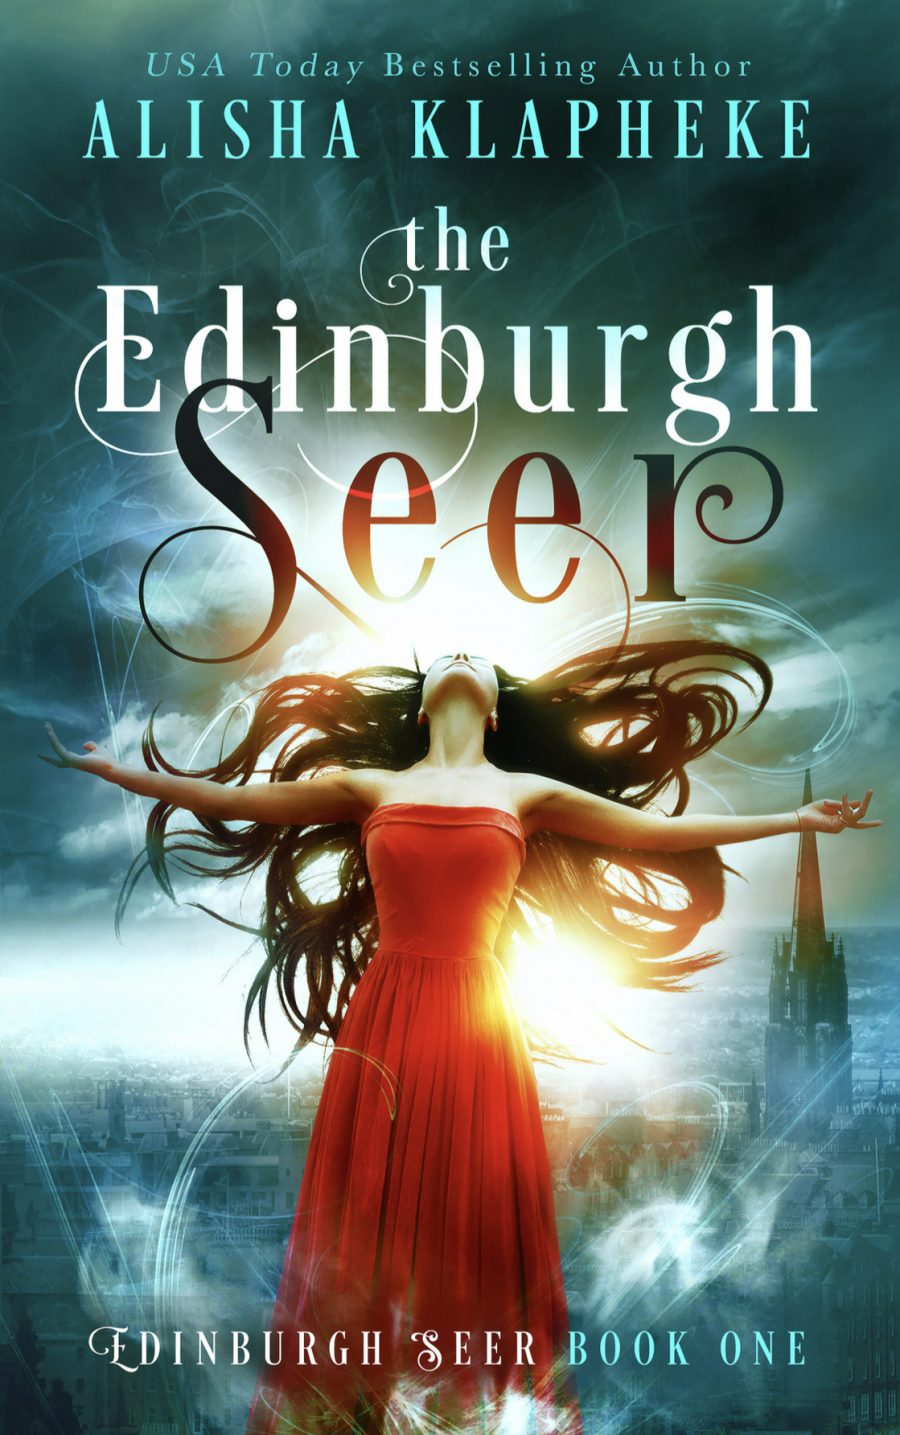 The Edinburgh Seer (Edinburgh Seer - Book 1) by Alisha Klapheke - A Book Review #PNR #Dystopian #AlteredHistory #SeriesComplete #3Stars #KindleUnlimited #KU